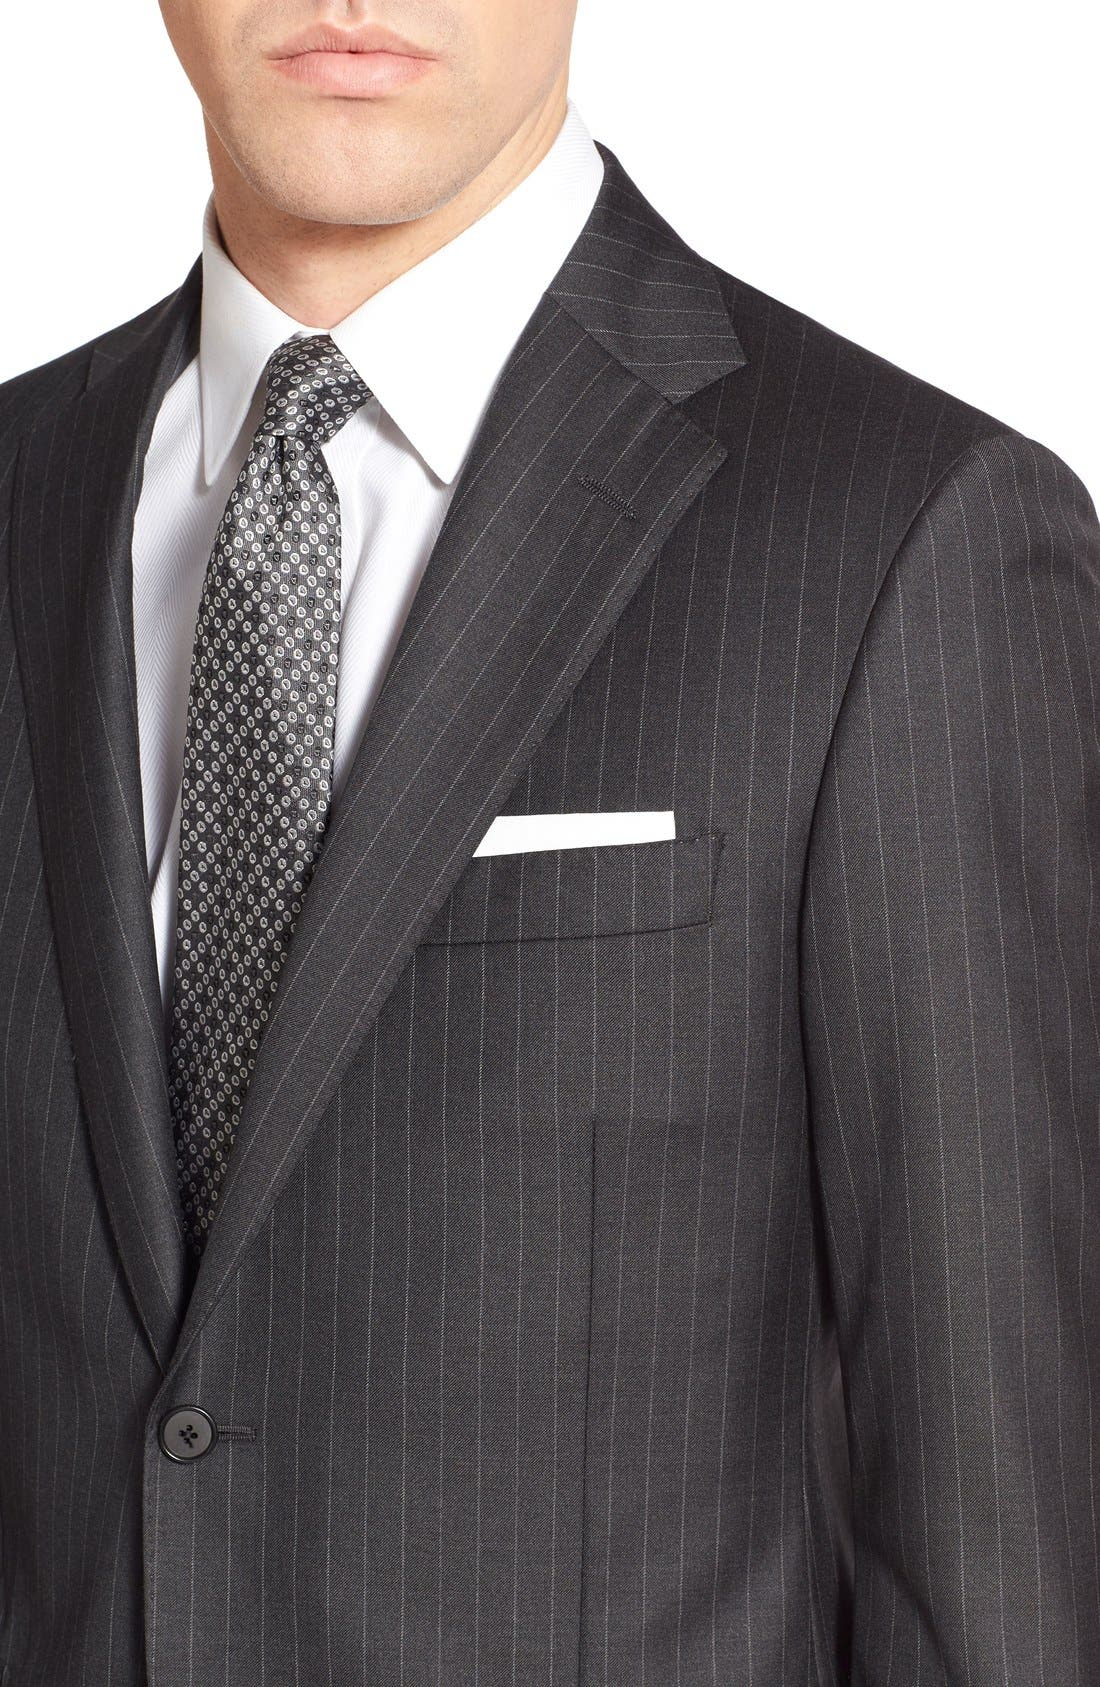 'Beacon - B Series' Classic Fit Stripe Wool Suit,                             Alternate thumbnail 2, color,                             031